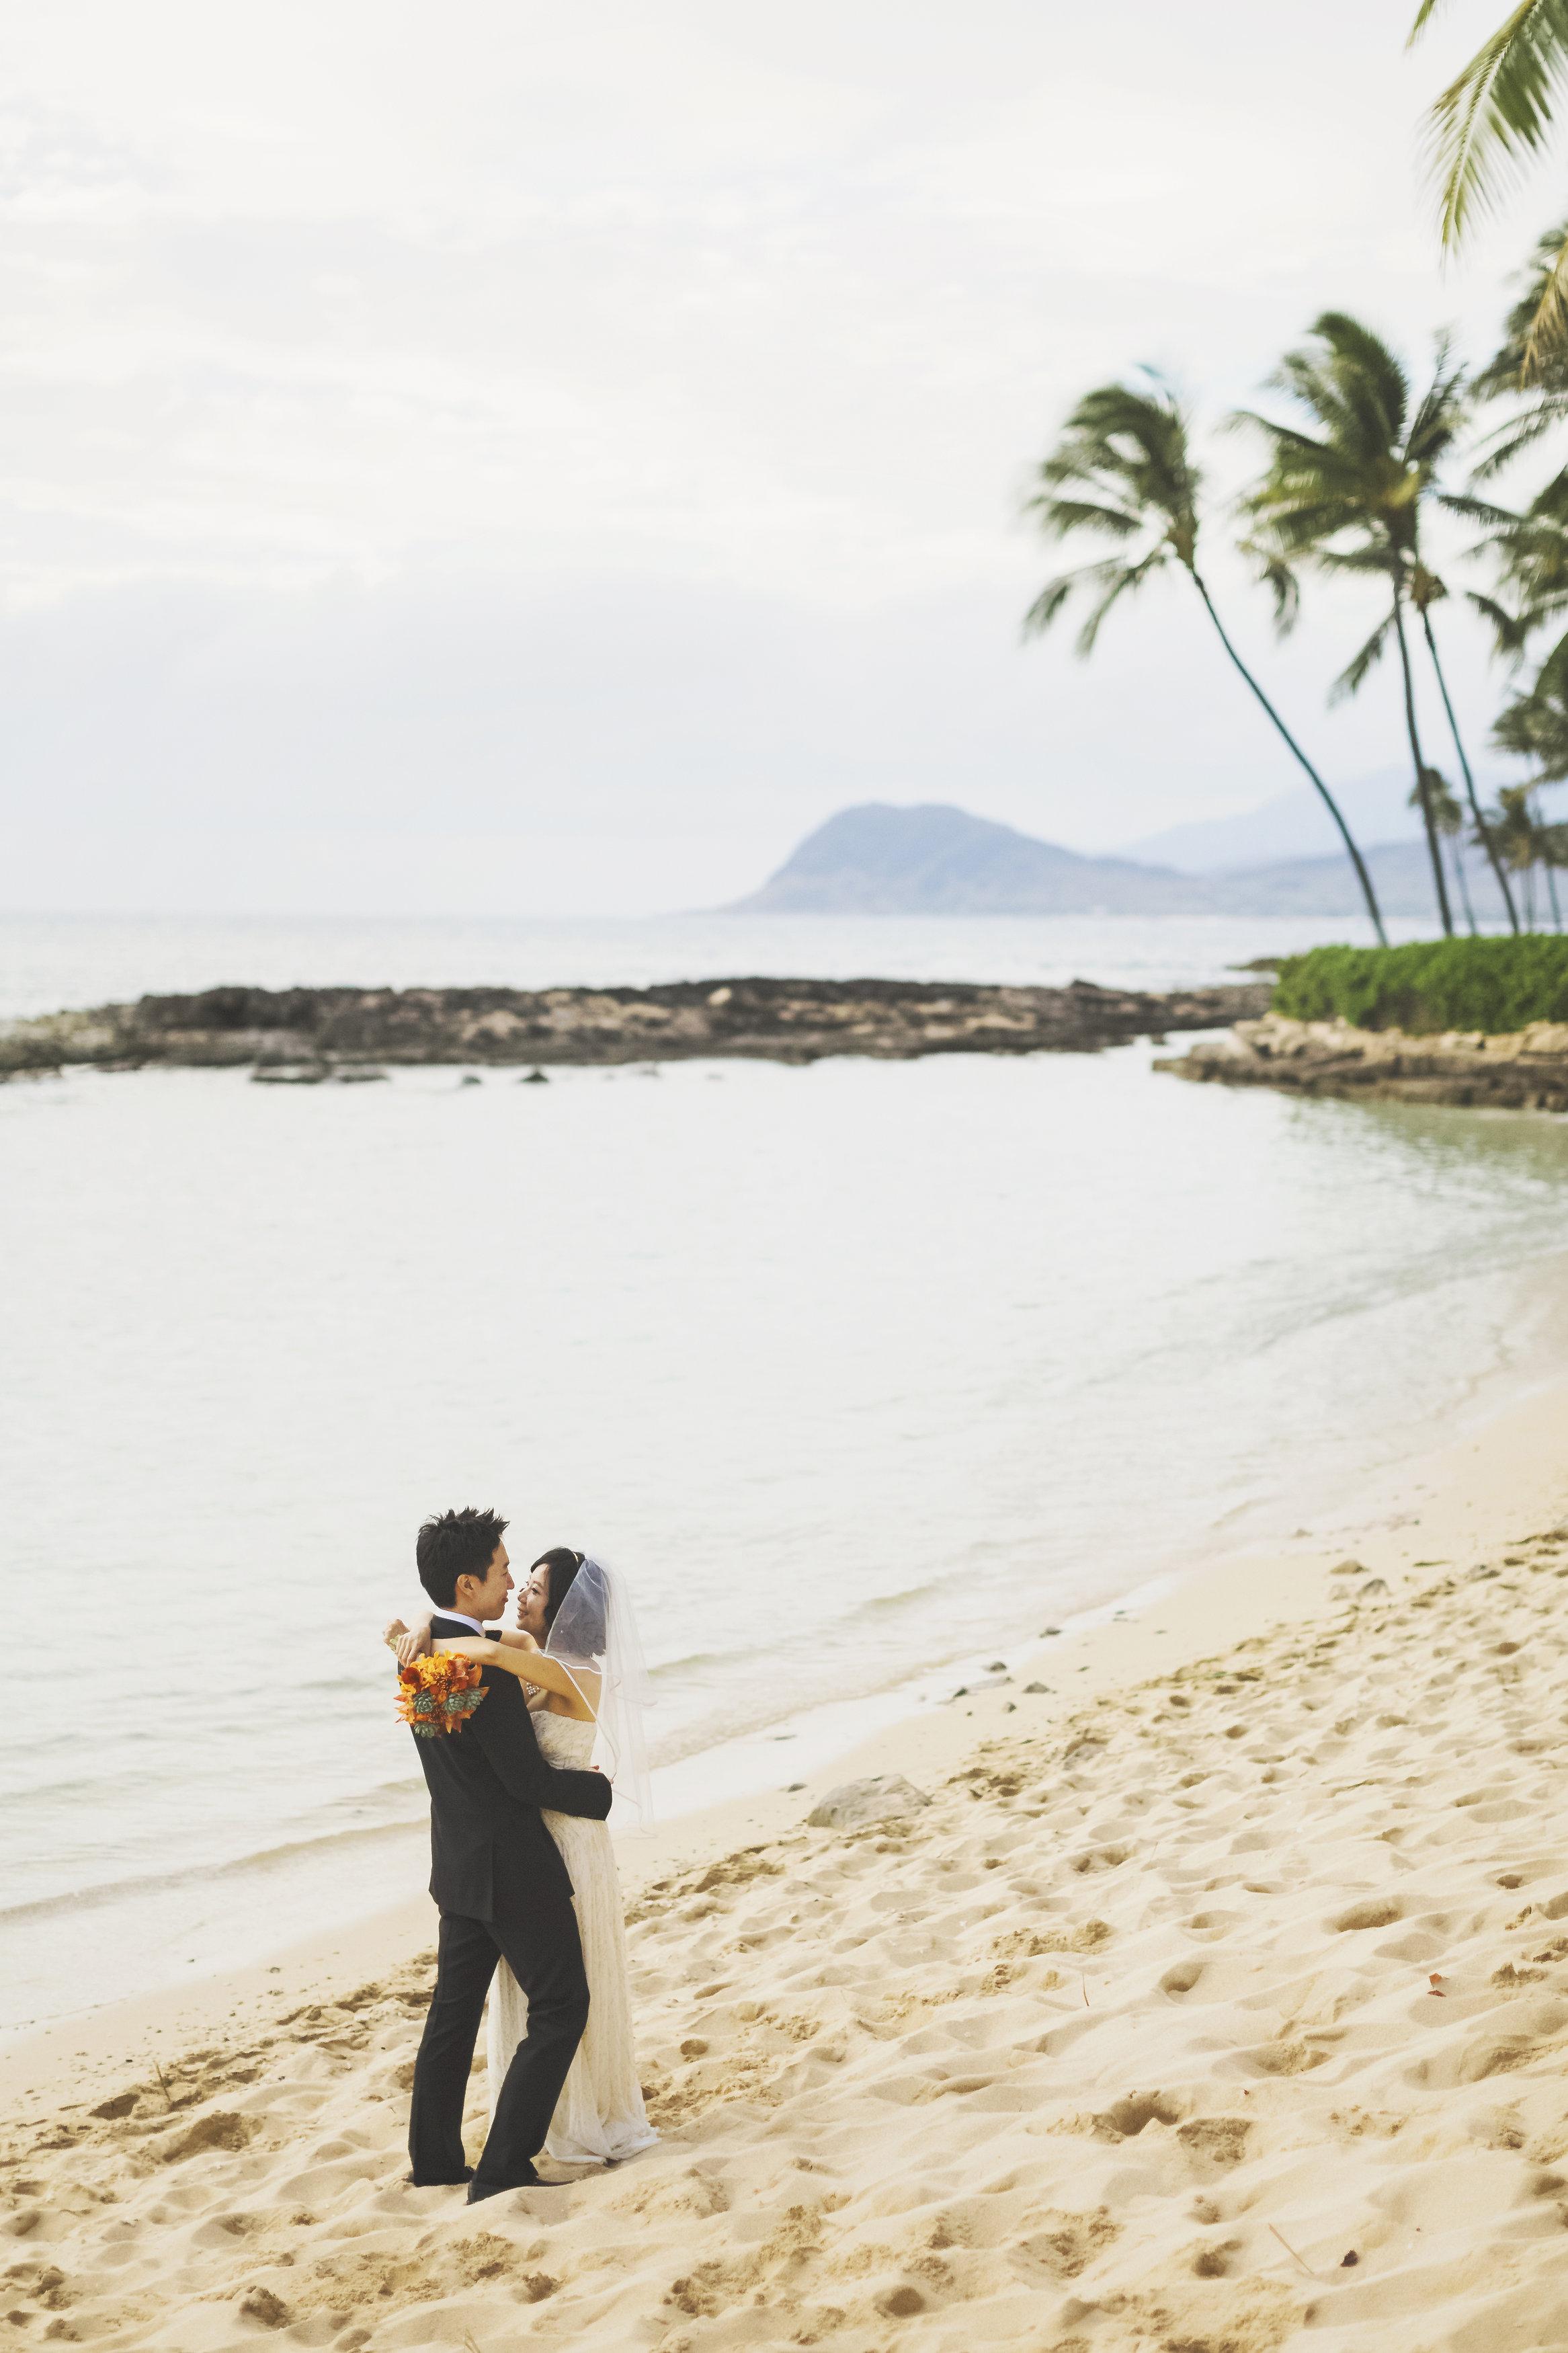 angie-diaz-photography-oahu-wedding-lanikuhonoa-shenshen-marshall-55.jpg